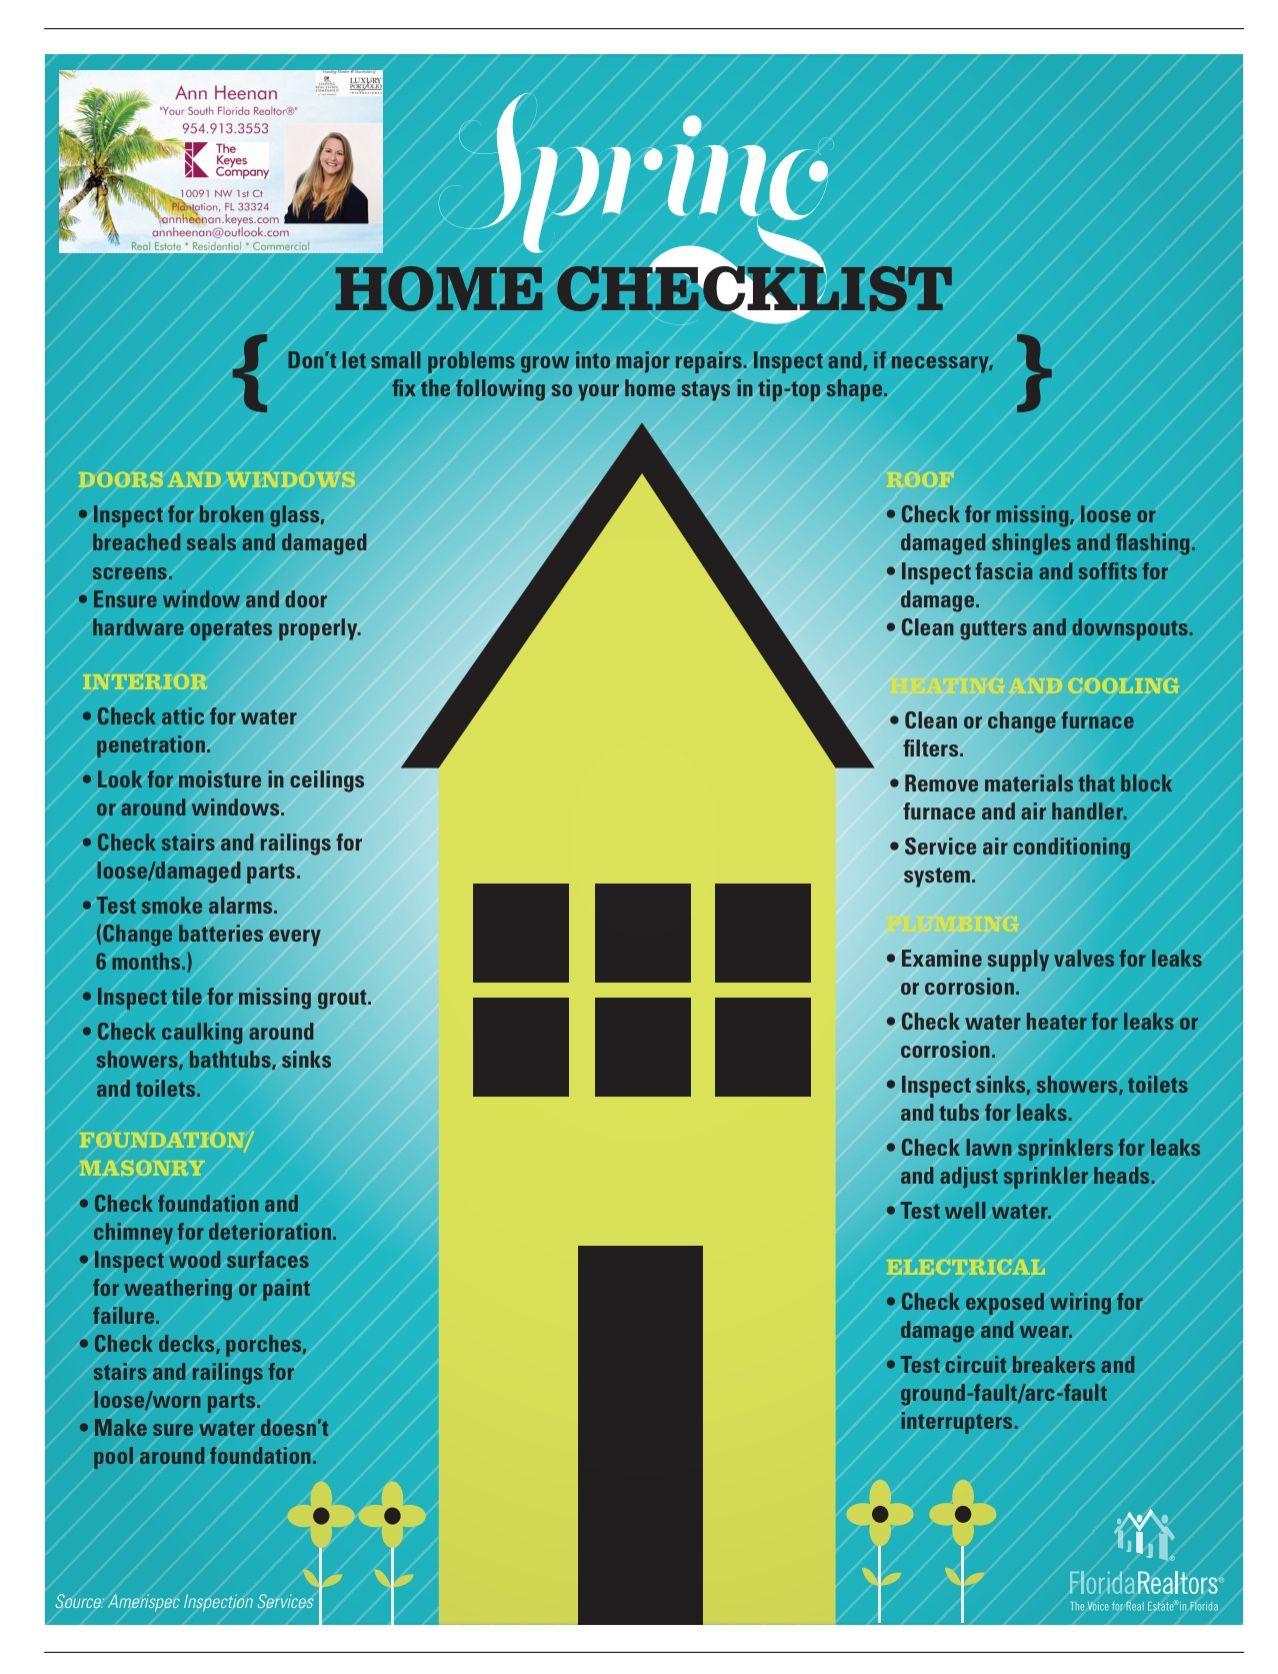 Spring Home Checklist | real estate in 2019 | Florida home